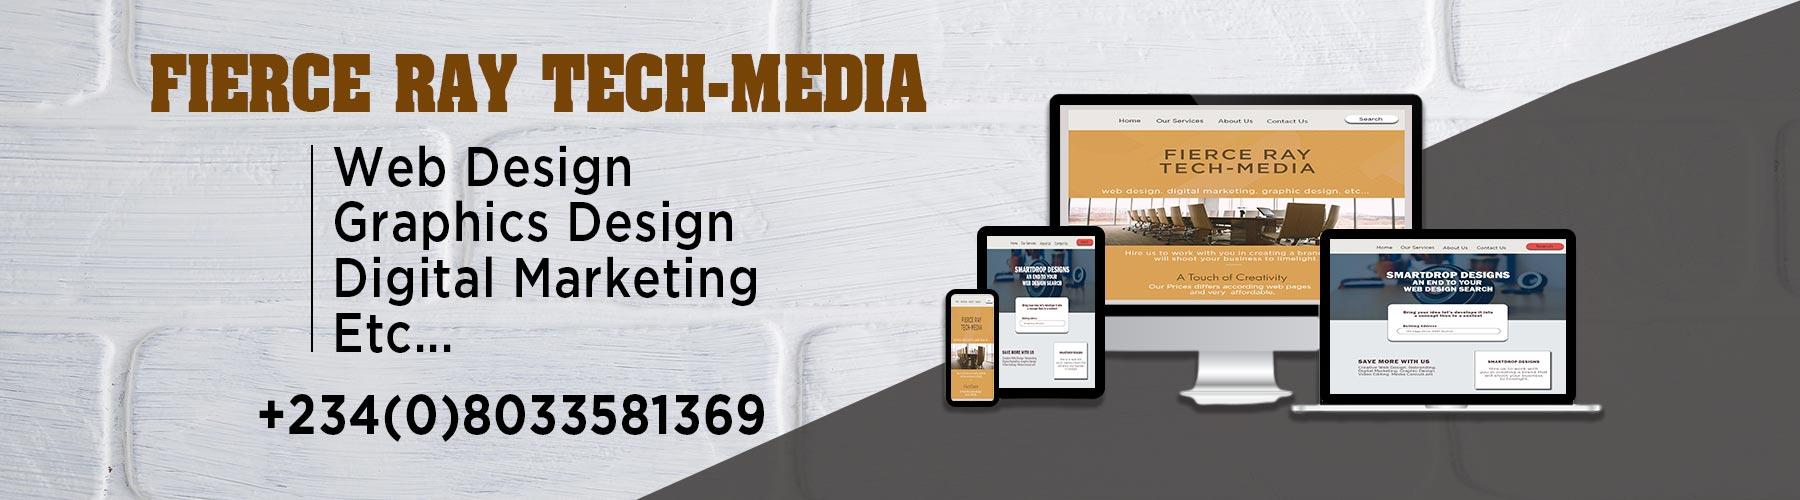 TECH MEDIA Banner Ad